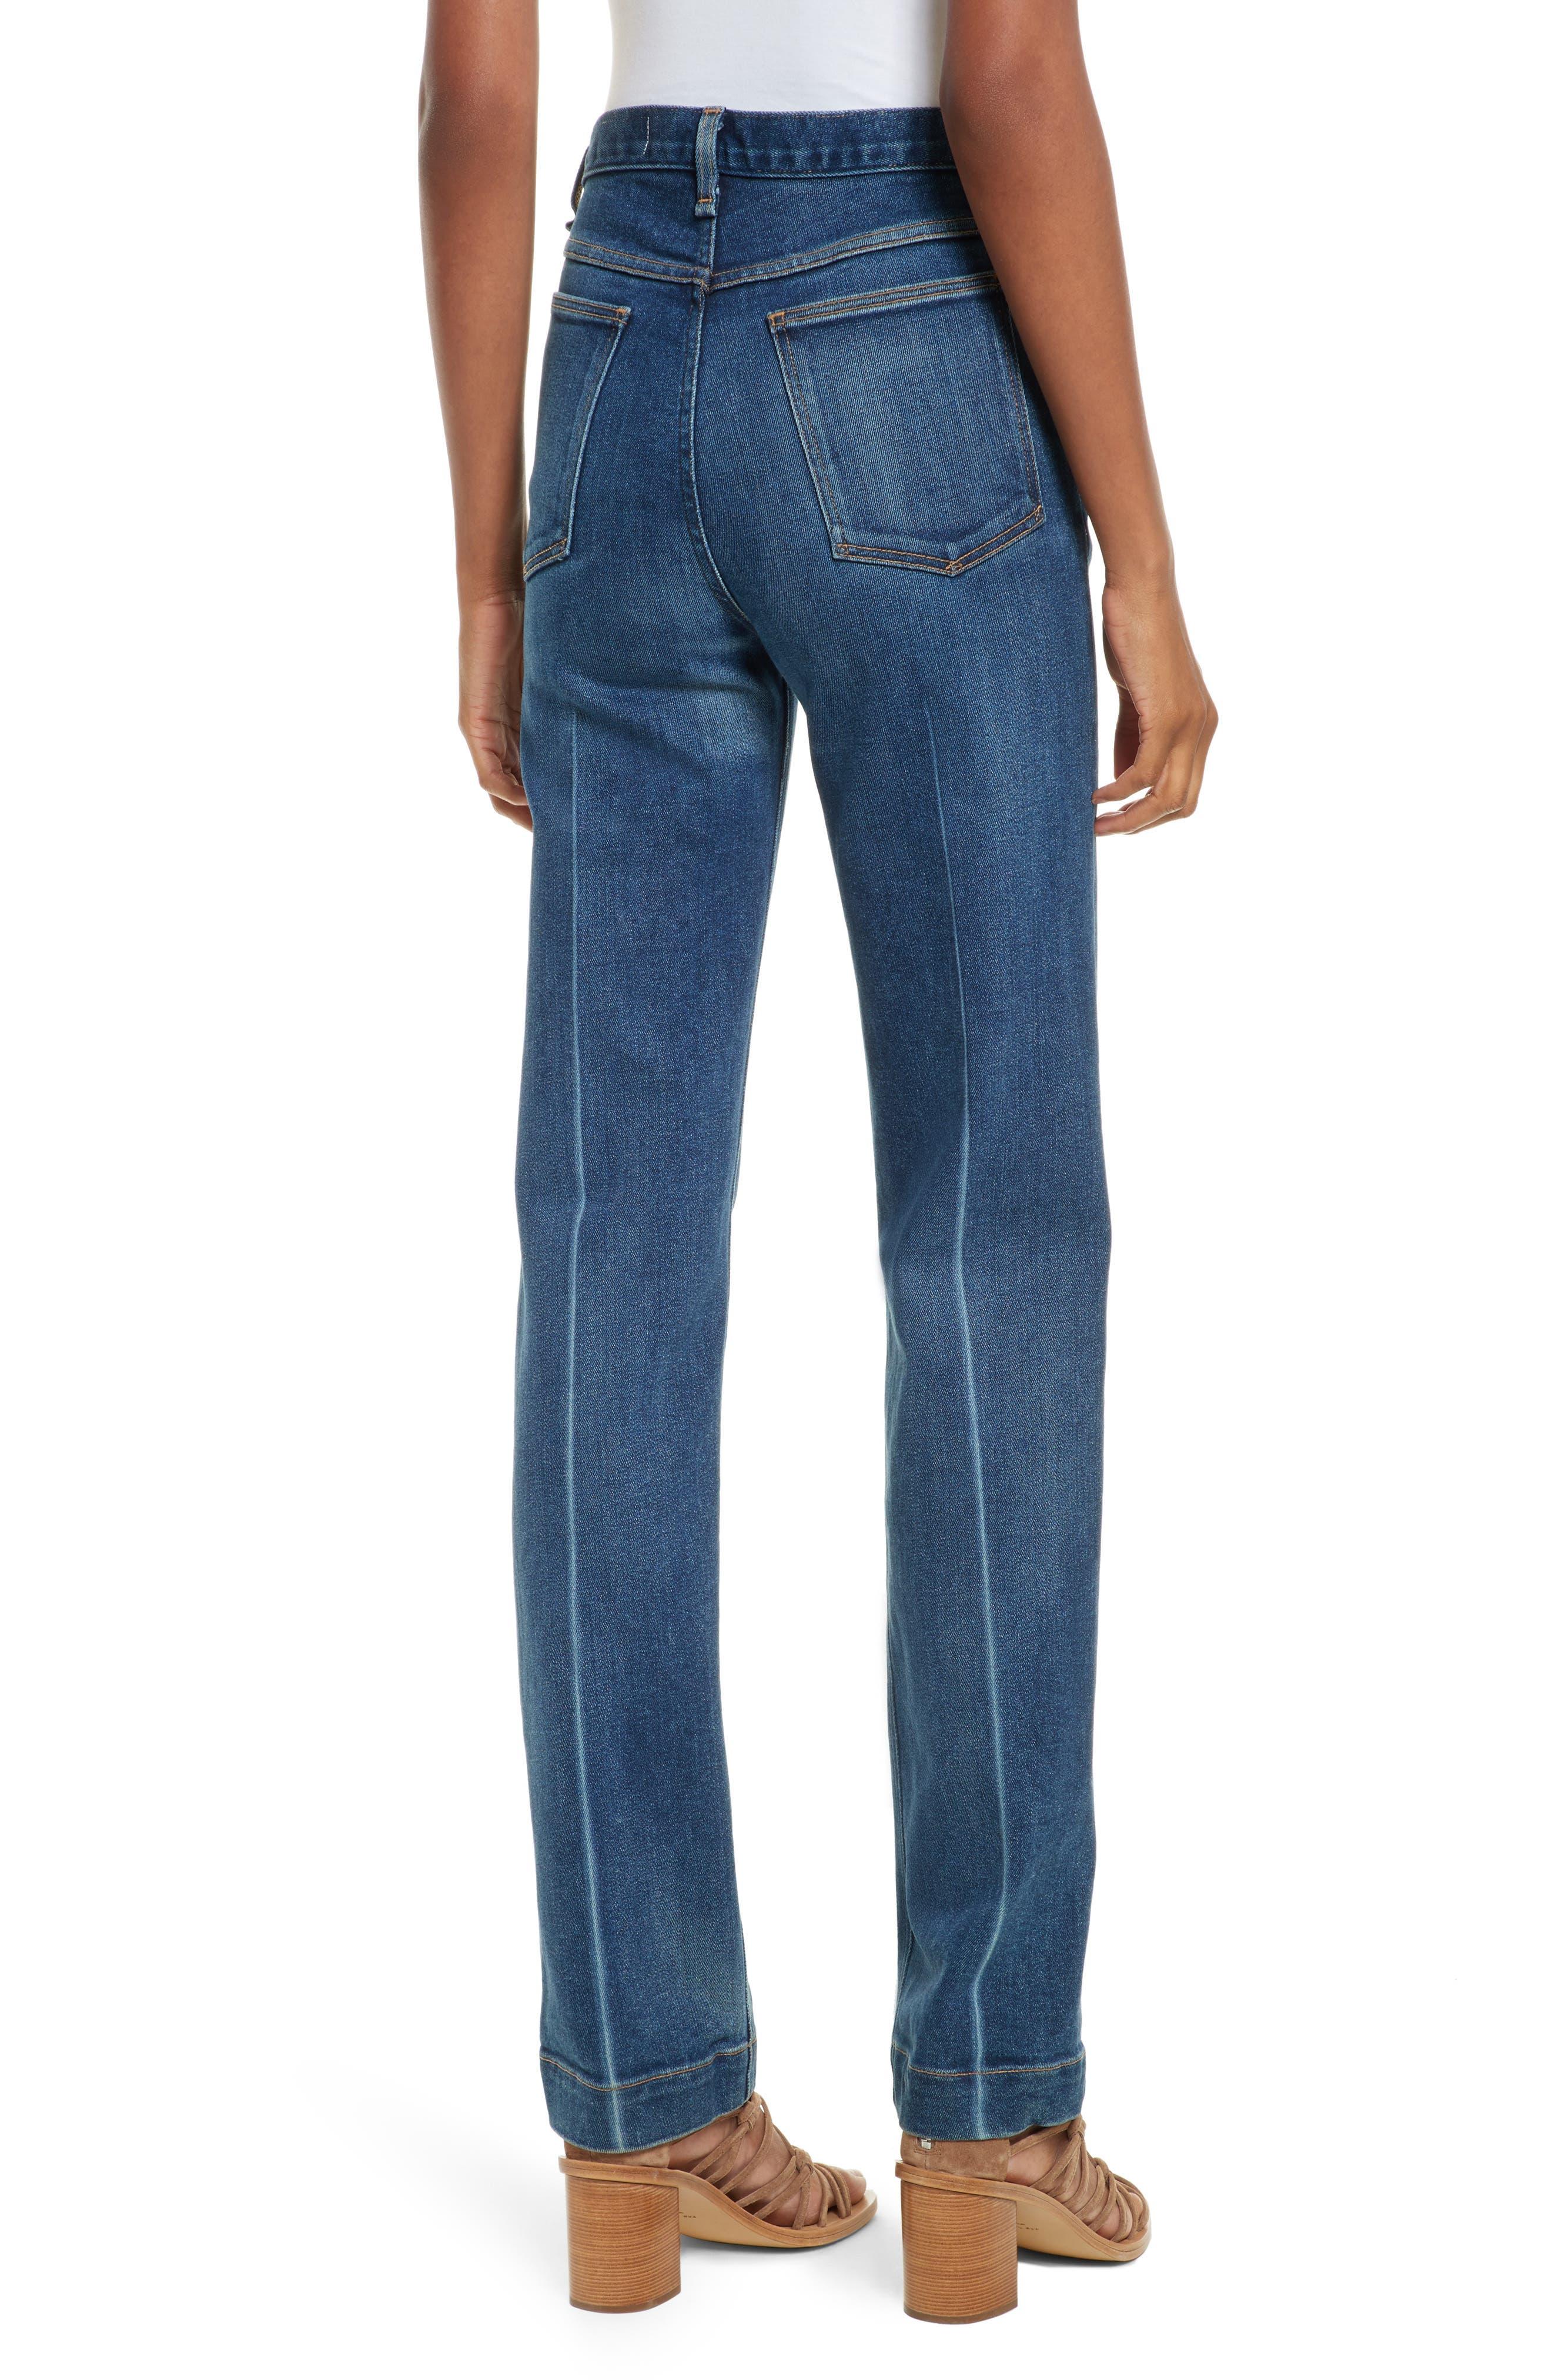 Justine High Waist Trouser Jeans,                             Alternate thumbnail 2, color,                             462